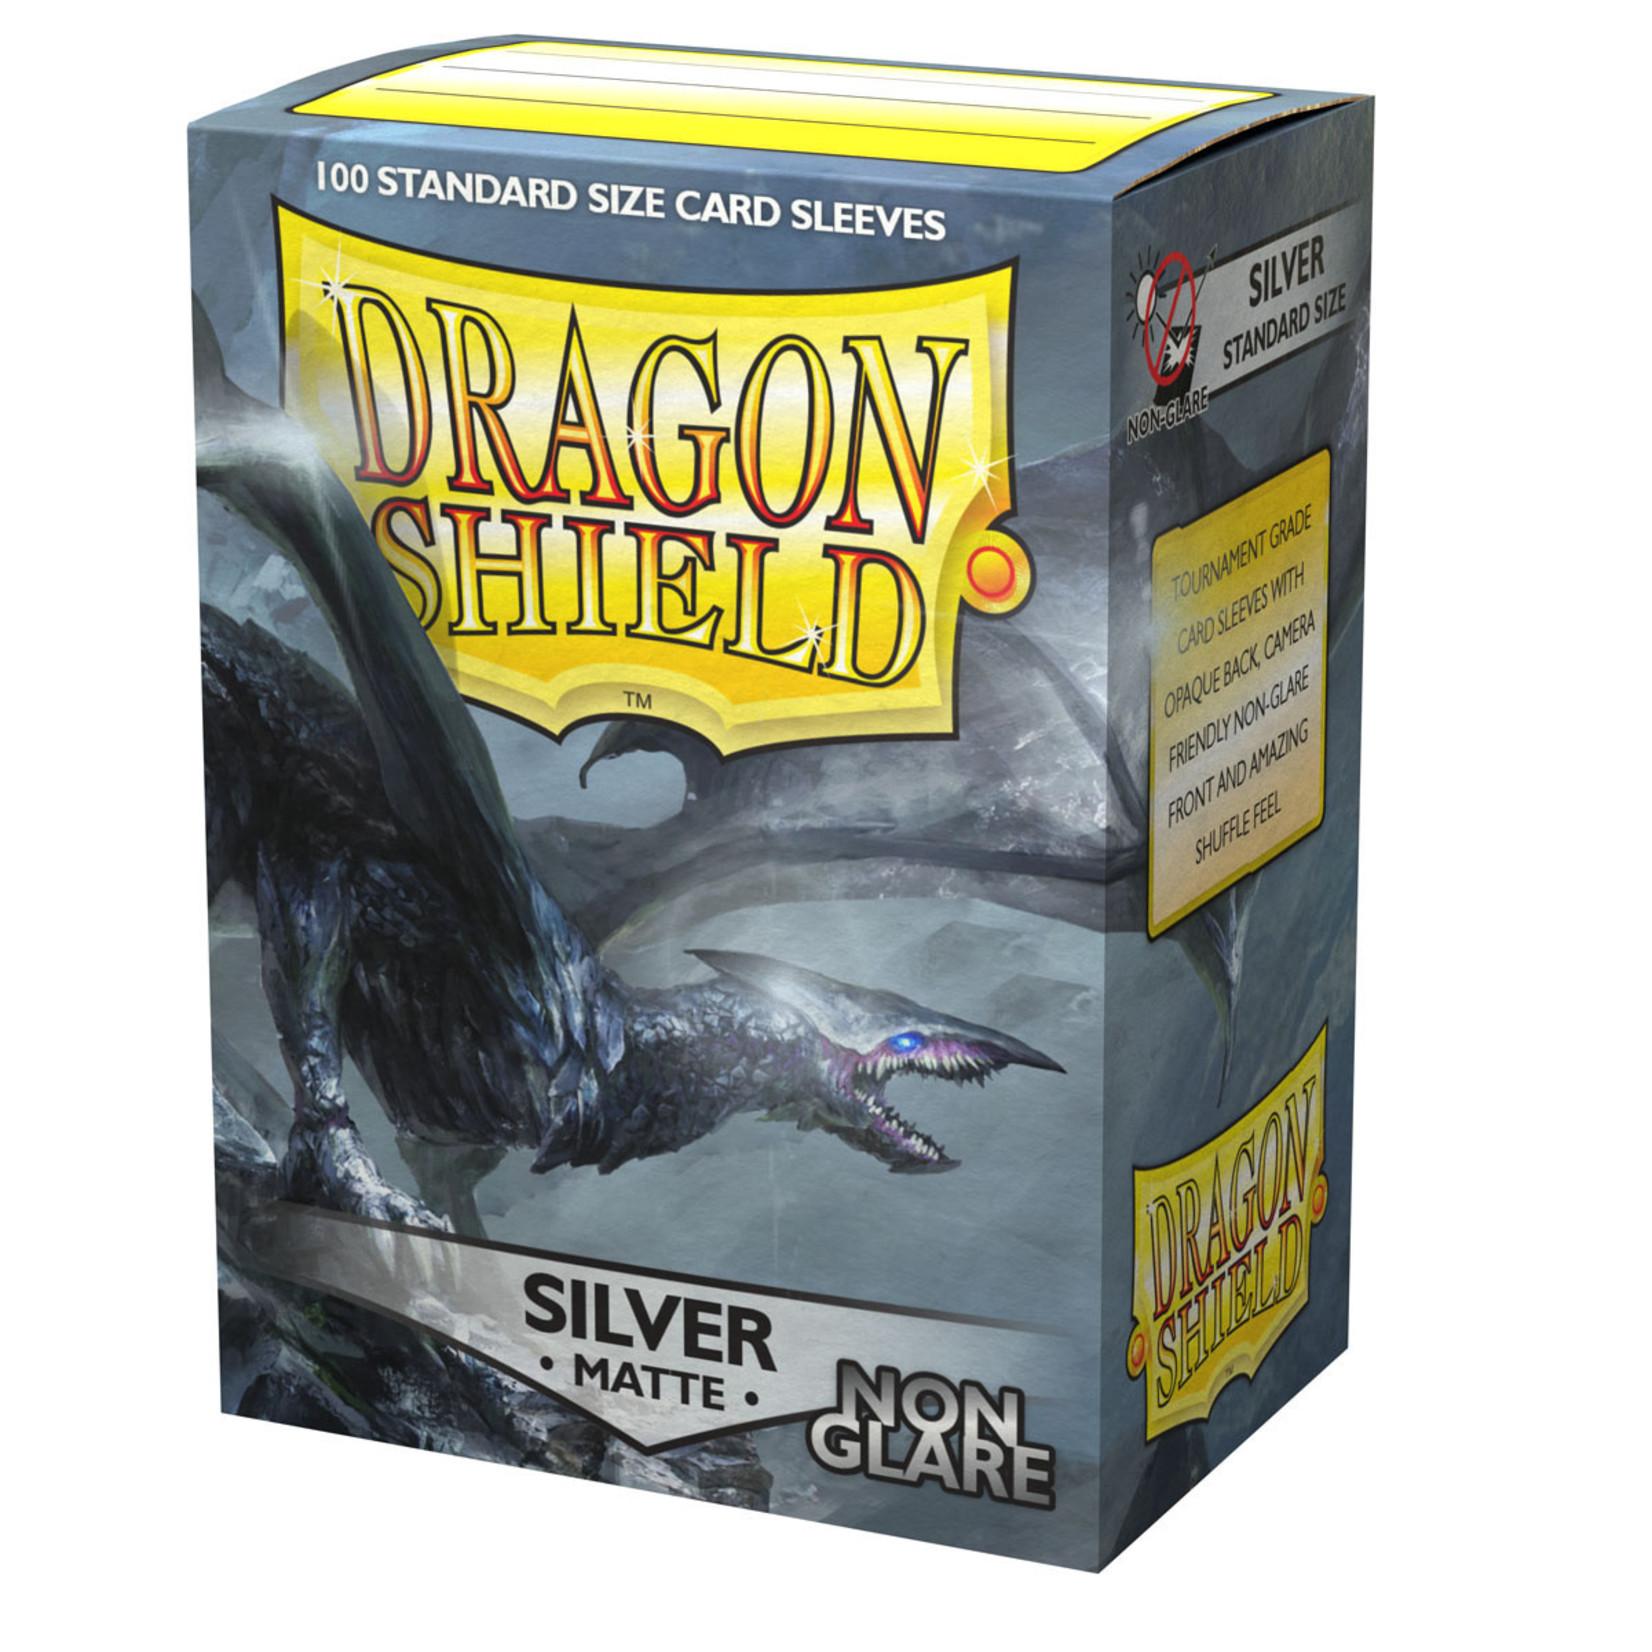 Arcane Tinmen Dragon Shield Matte Non-Glare Silver